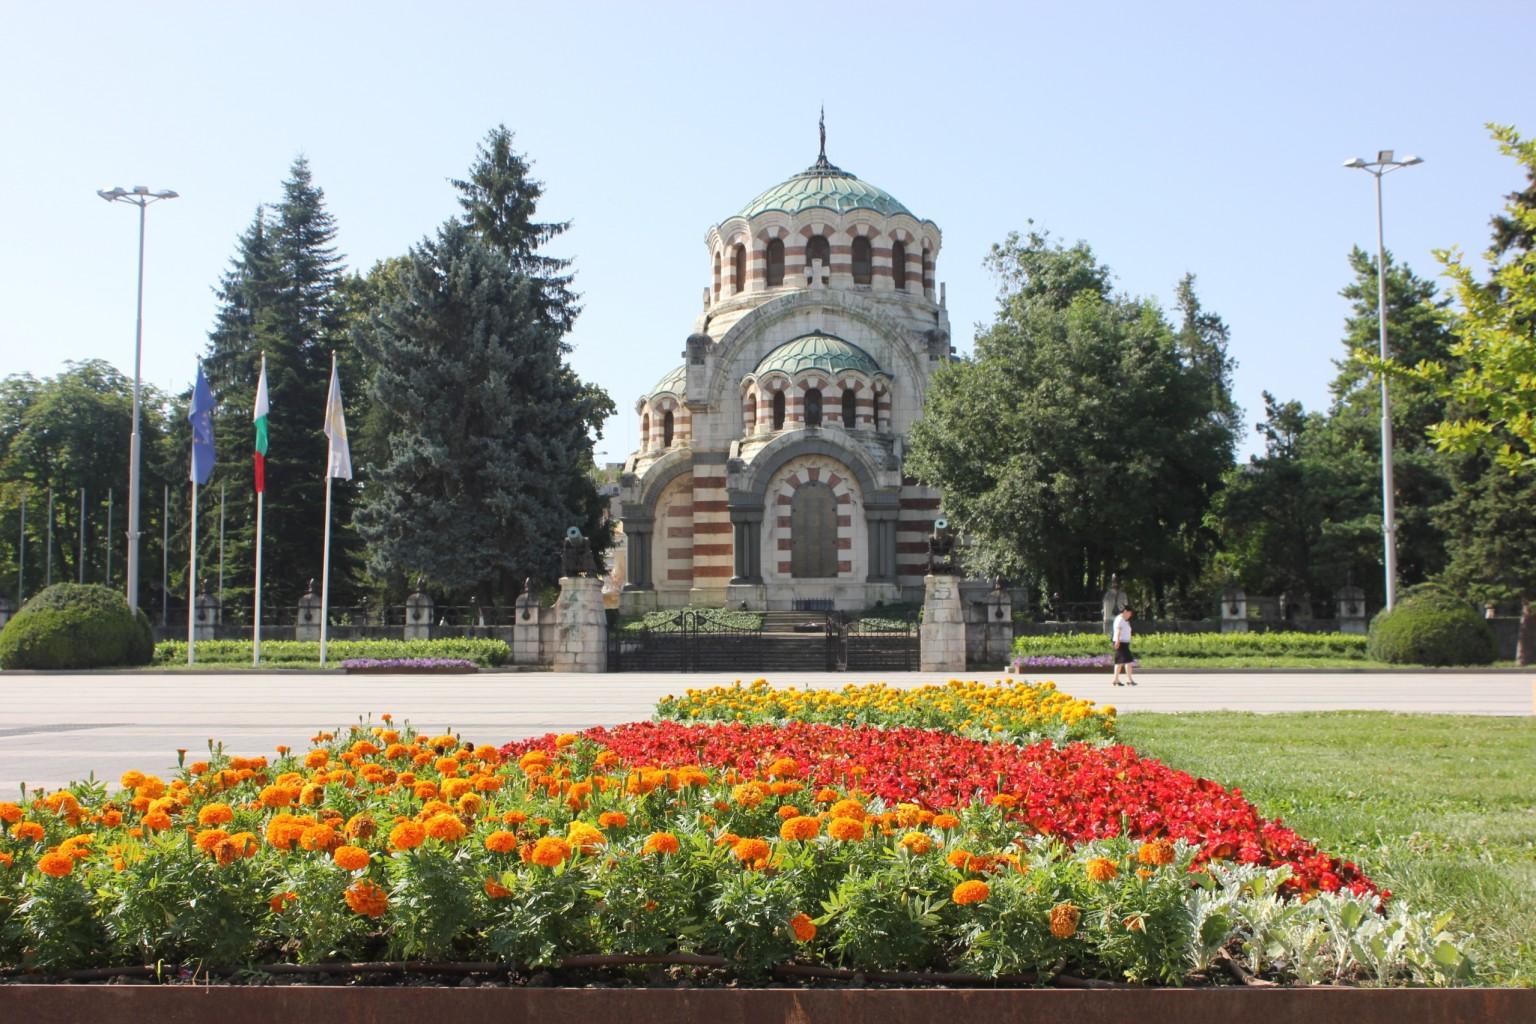 Free WiFi in all public places in Pleven